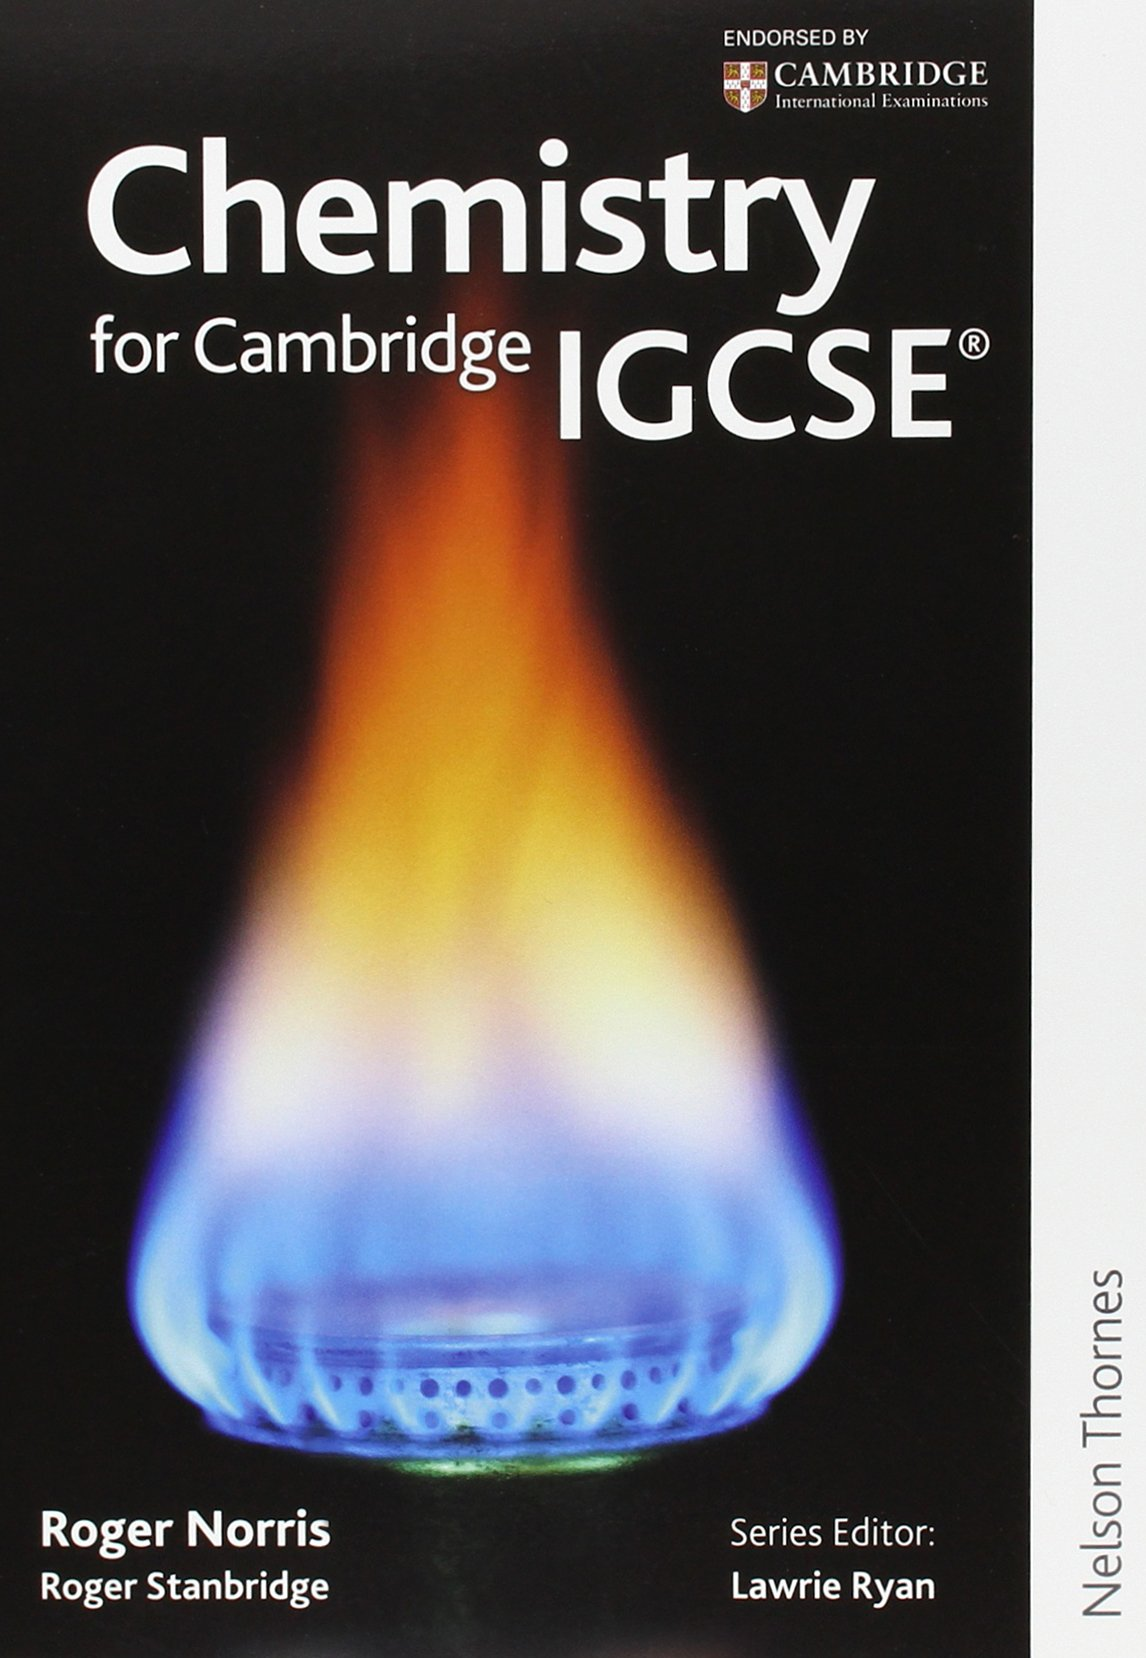 Chemistry for cambridge igcse roger norris roger standbridge chemistry for cambridge igcse roger norris roger standbridge lawrie ryan 9781408500187 amazon books fandeluxe Gallery